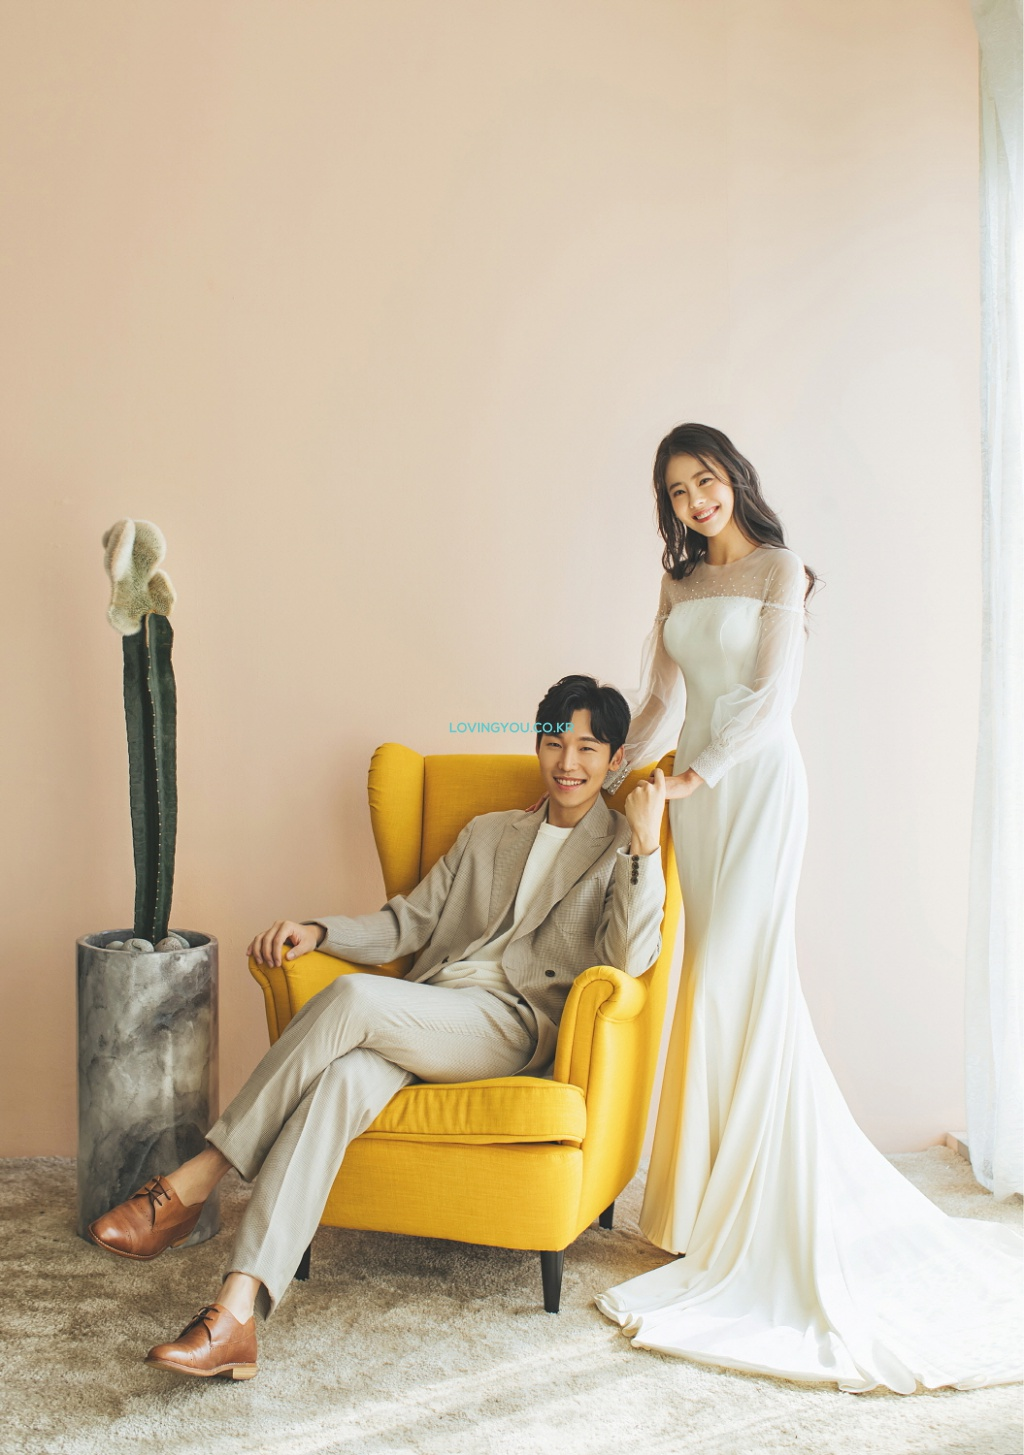 MAY STUDIO [2019] - KOREA PRE WEDDING PHOTOSHOOT by LOVINGYOU